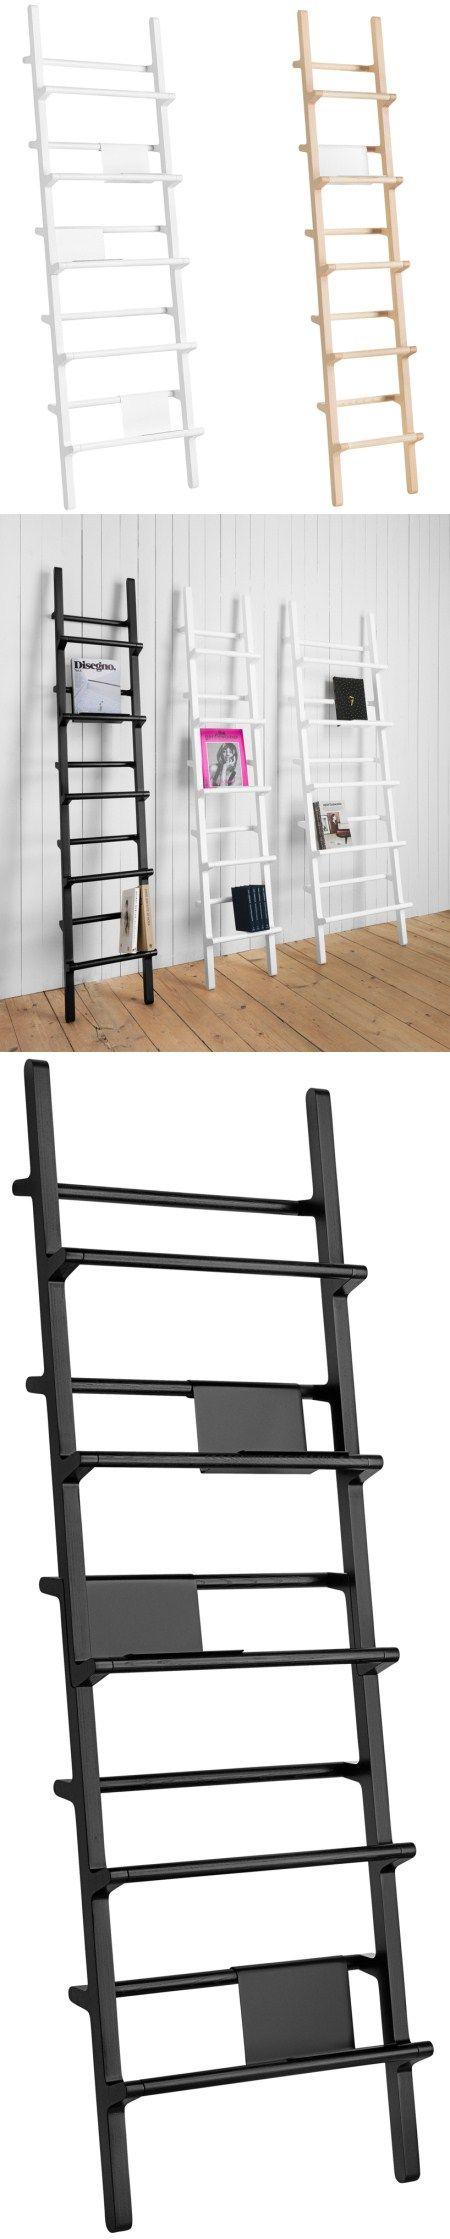 Multi-purpose ladder bookshelf